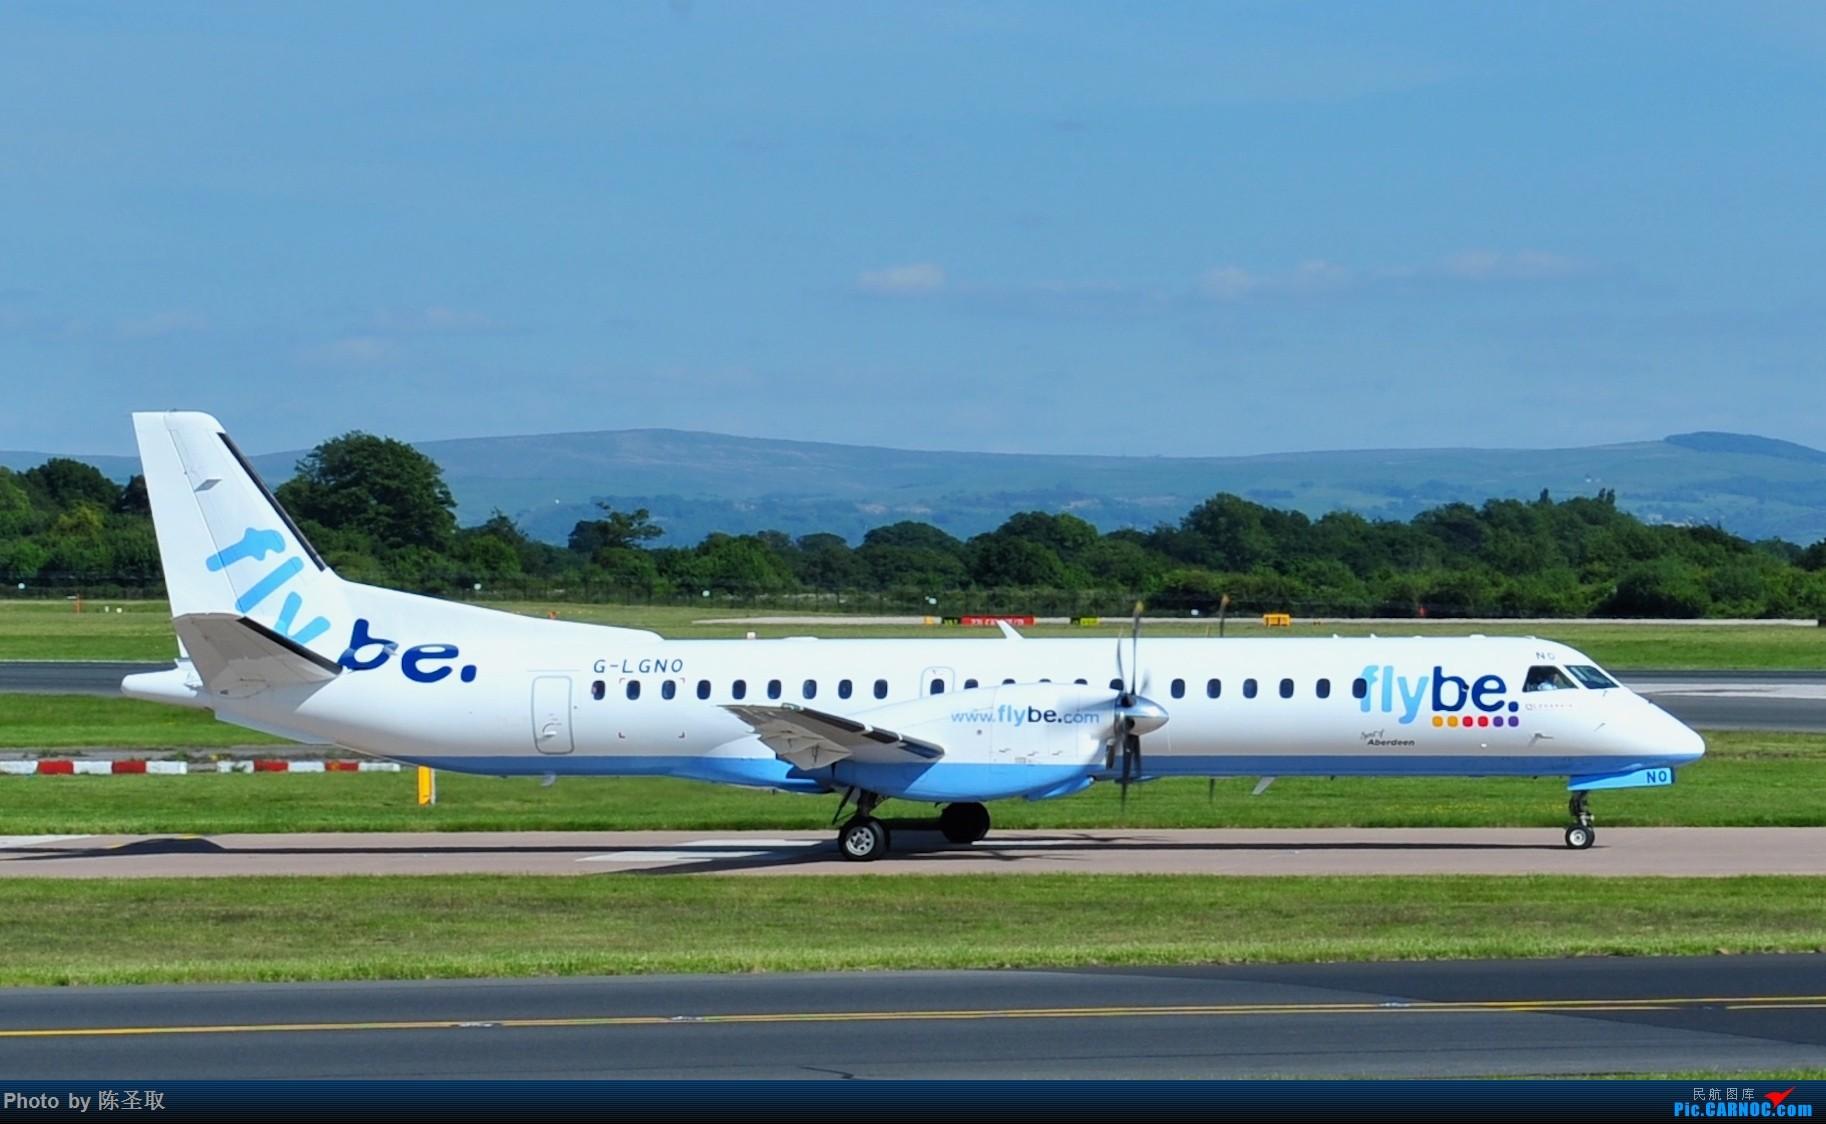 Re:[原创]迟来的6月曼城拍机图。廉价航空的天堂,曼彻斯特机场~ SAAB SCANIA 2000 G-LGNO 英国曼彻斯特机场